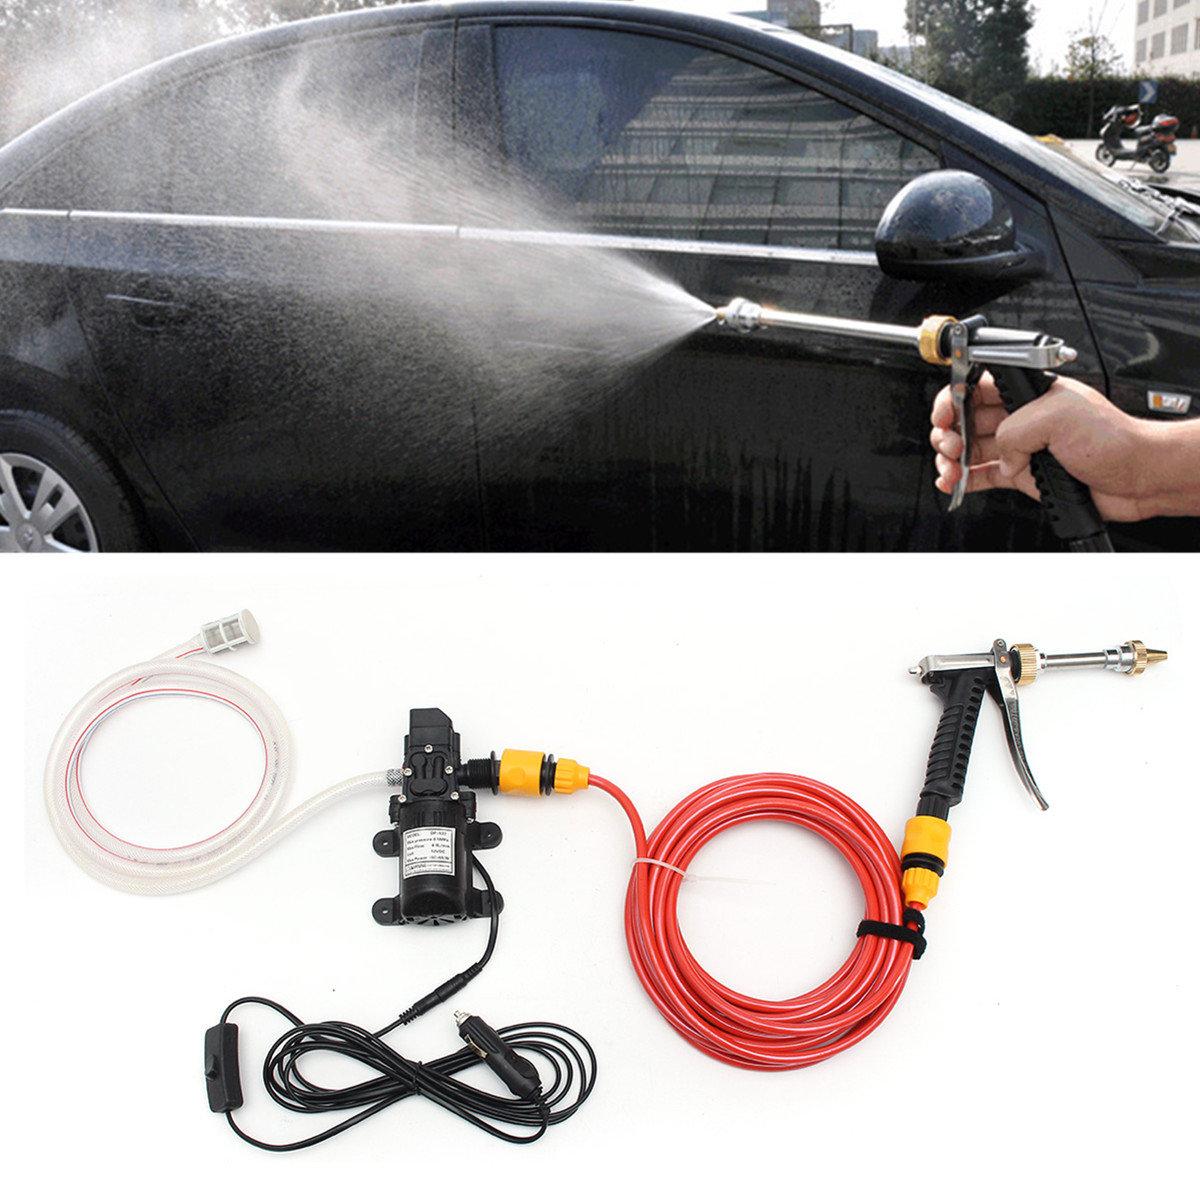 Kit lavage voiture